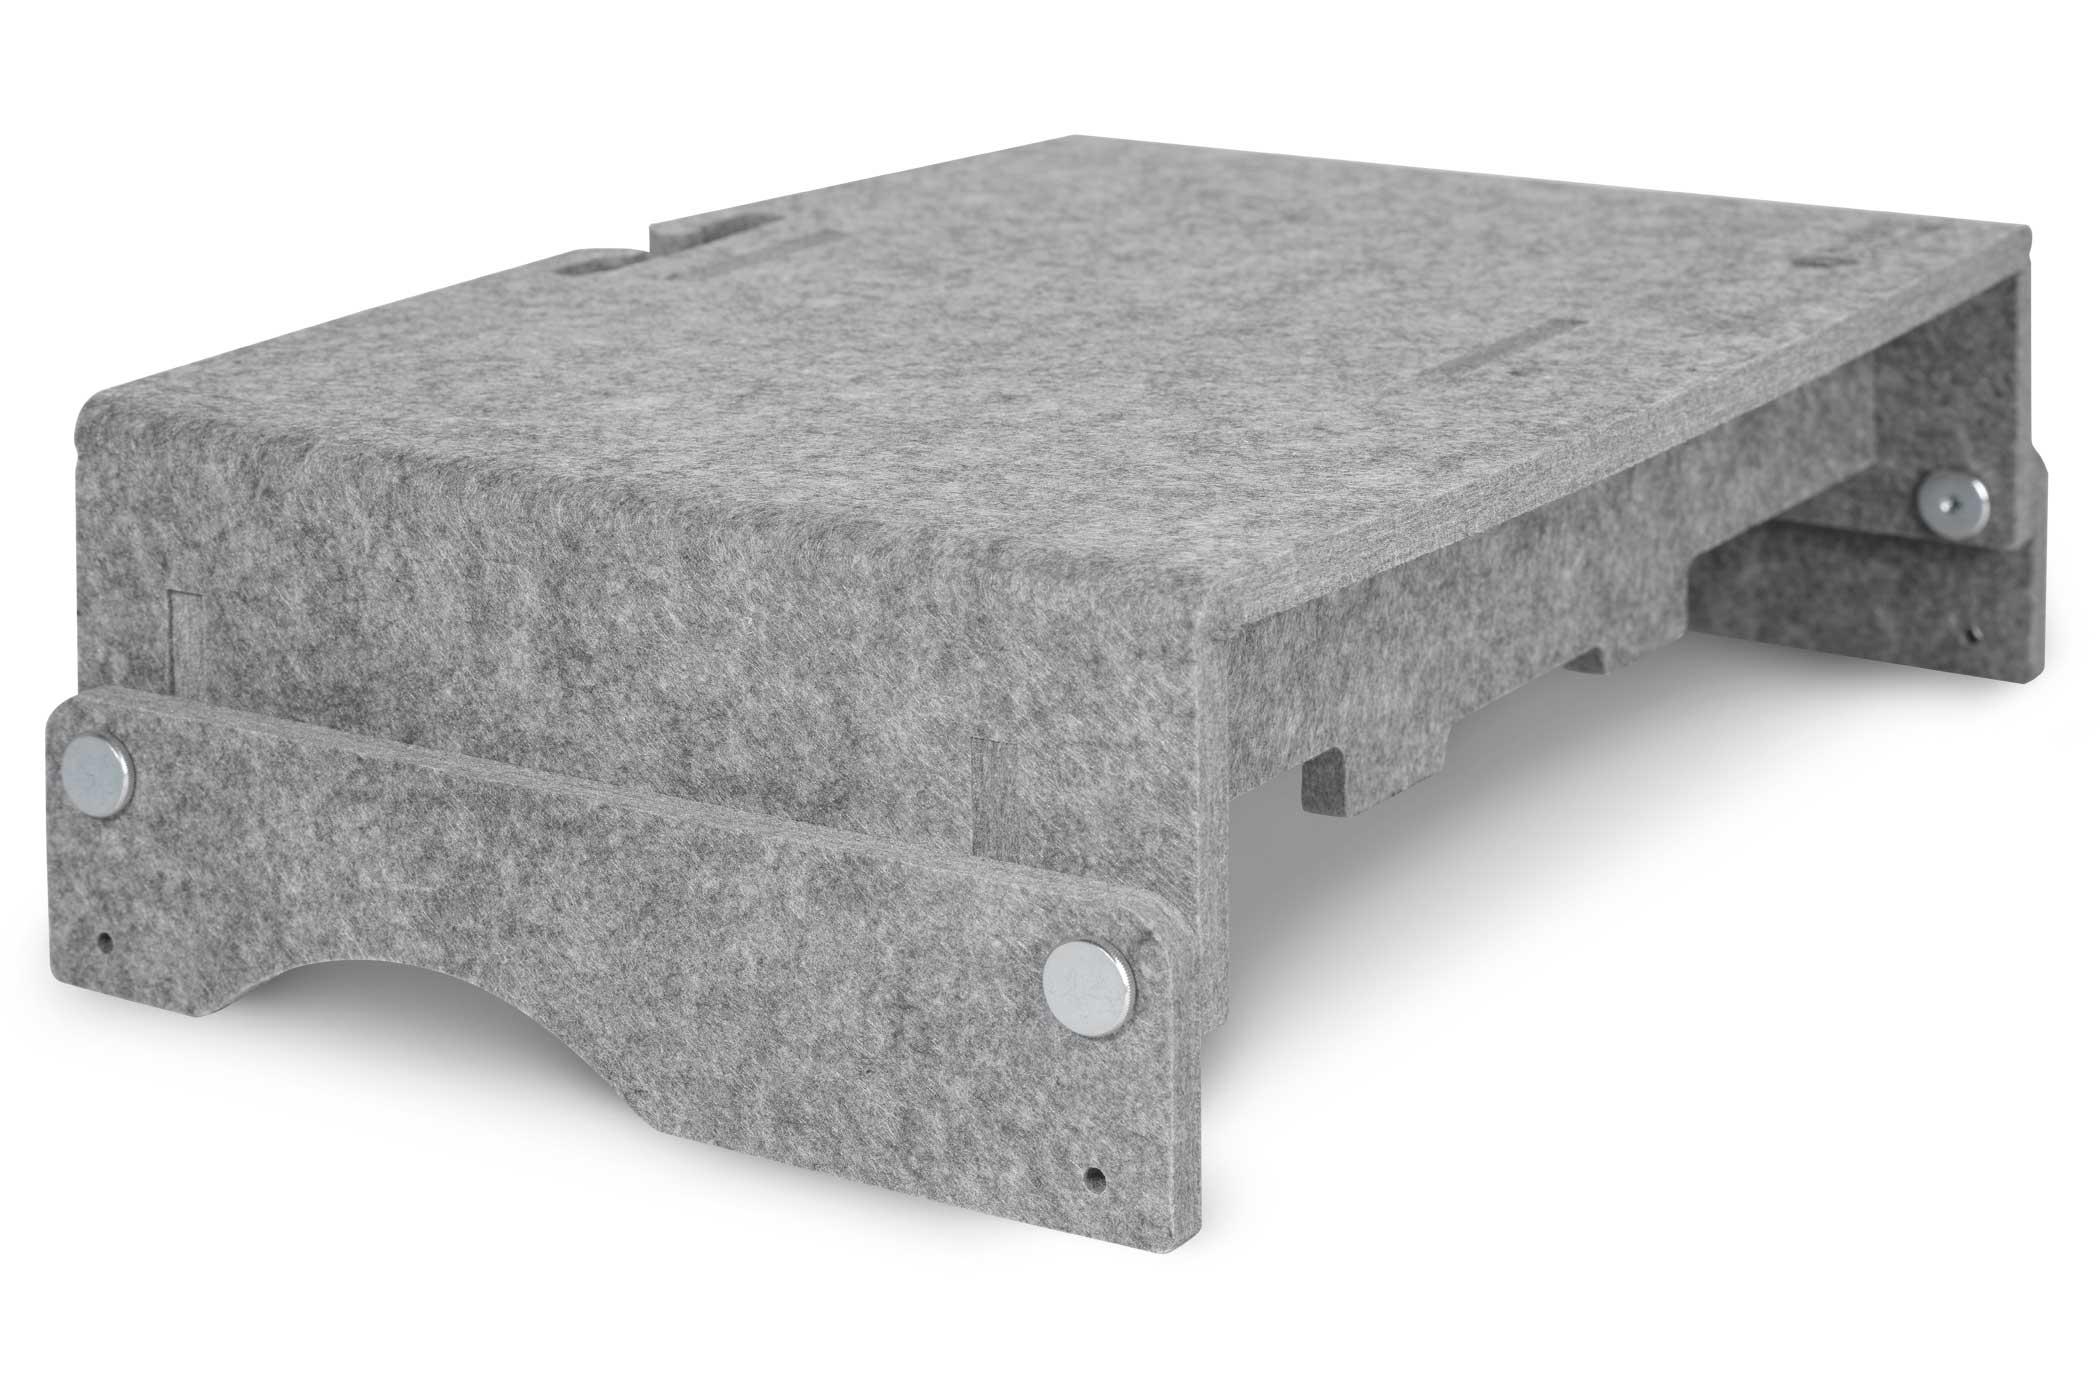 Vorschau: Bakker Q-riser 110 Circular - 43,2 cm (17 Zoll) - Grau